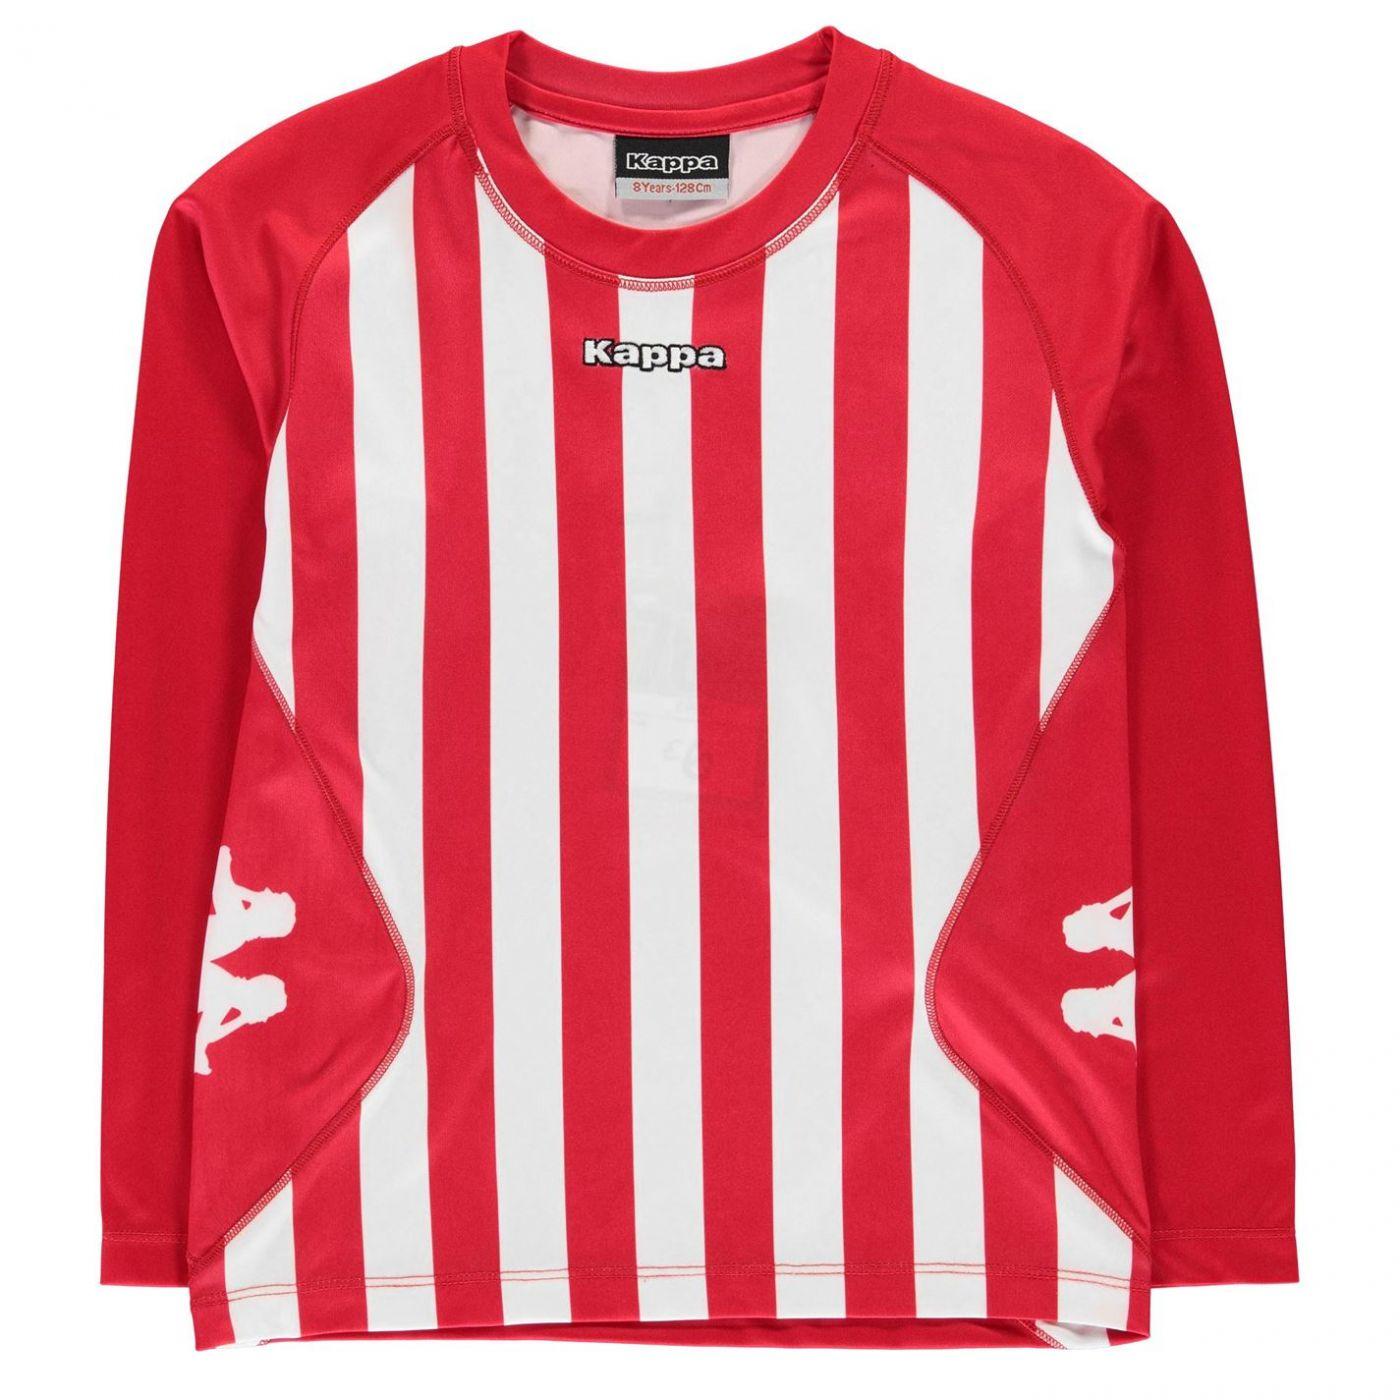 8c196d3f45f9e Kappa Barletta Long Sleeve T Shirt Junior Boys - FACTCOOL